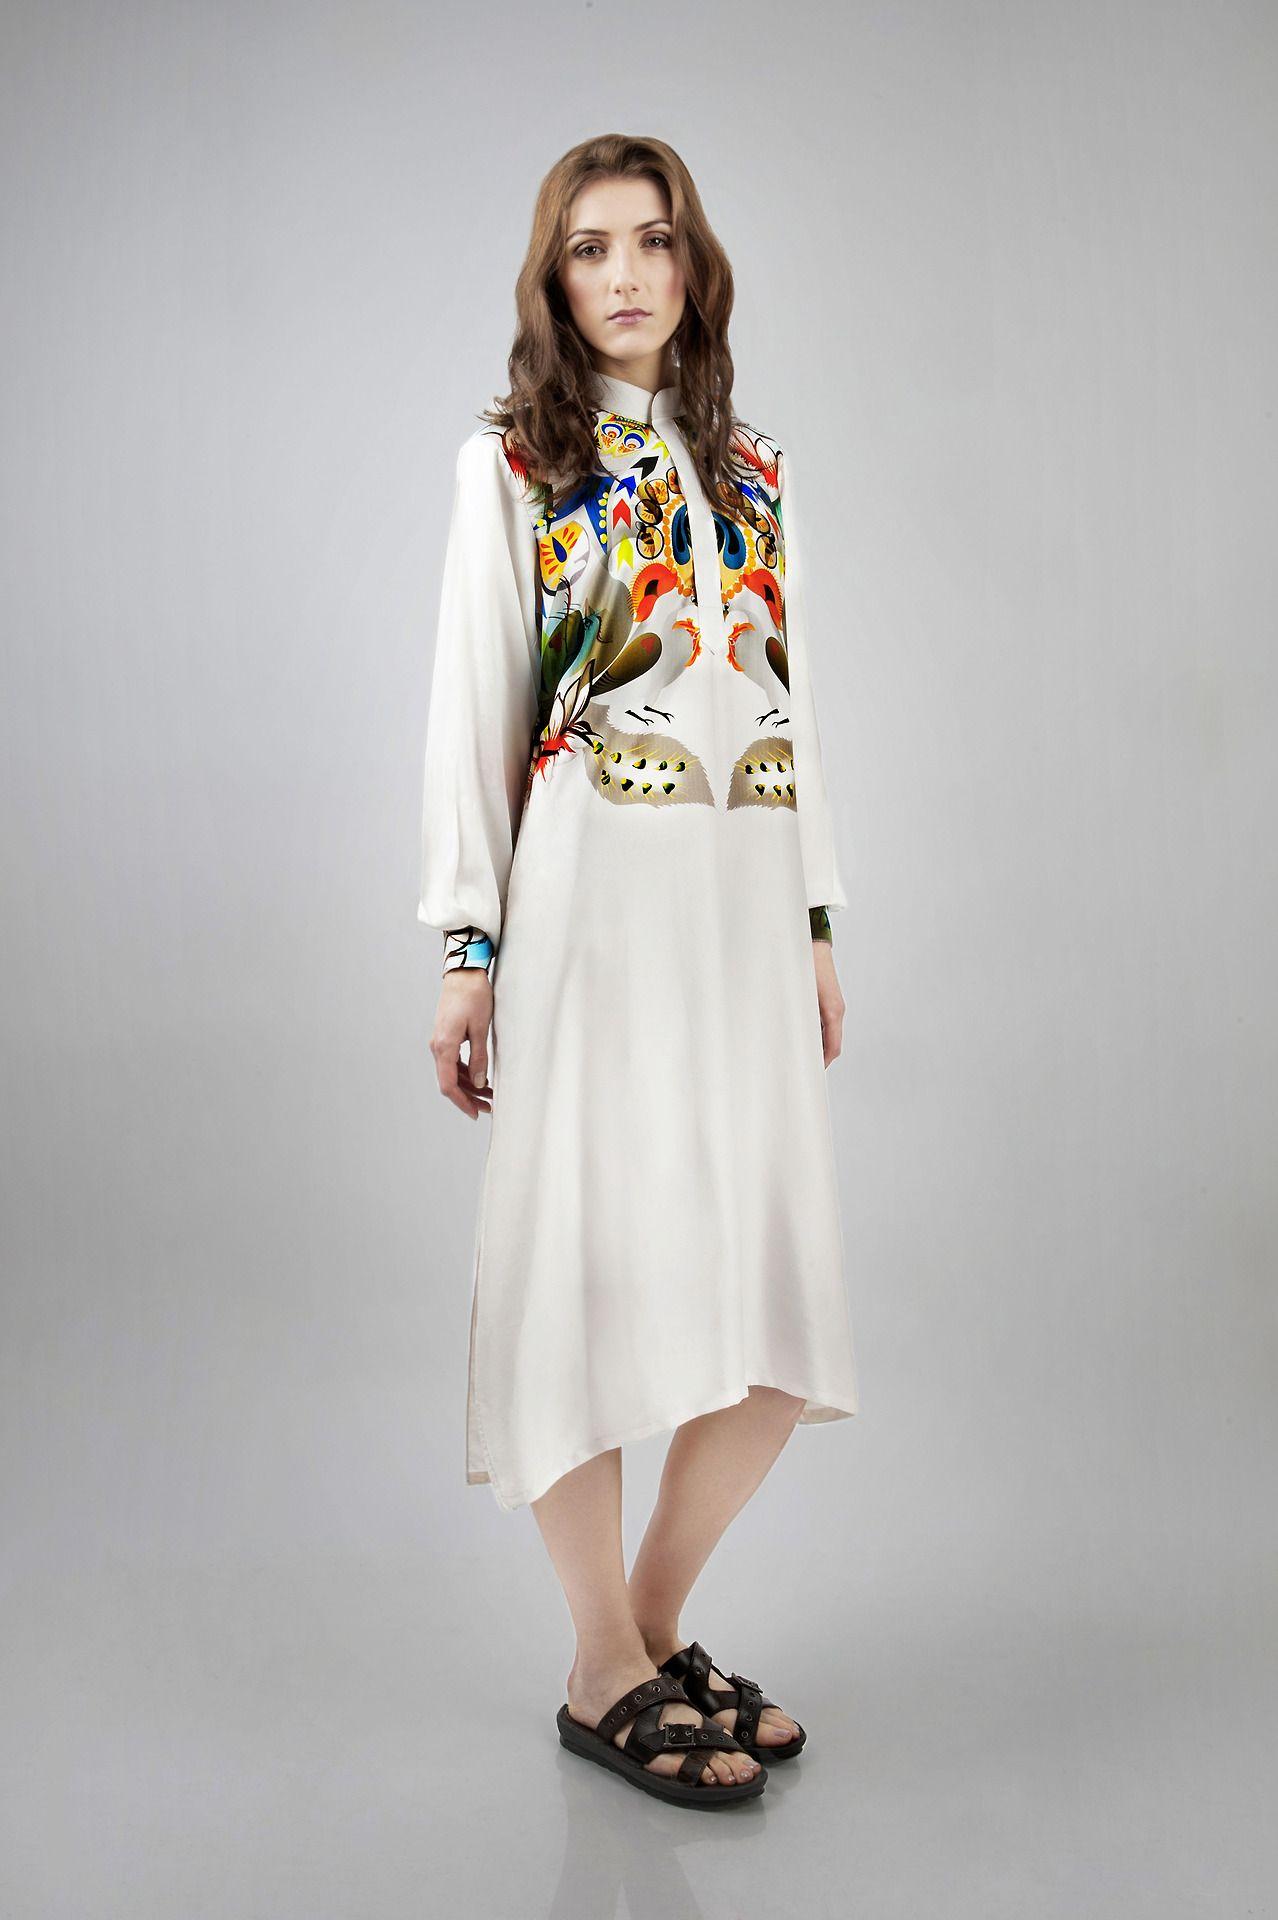 Masala chai bangladesh designer rukia begum fashion design south